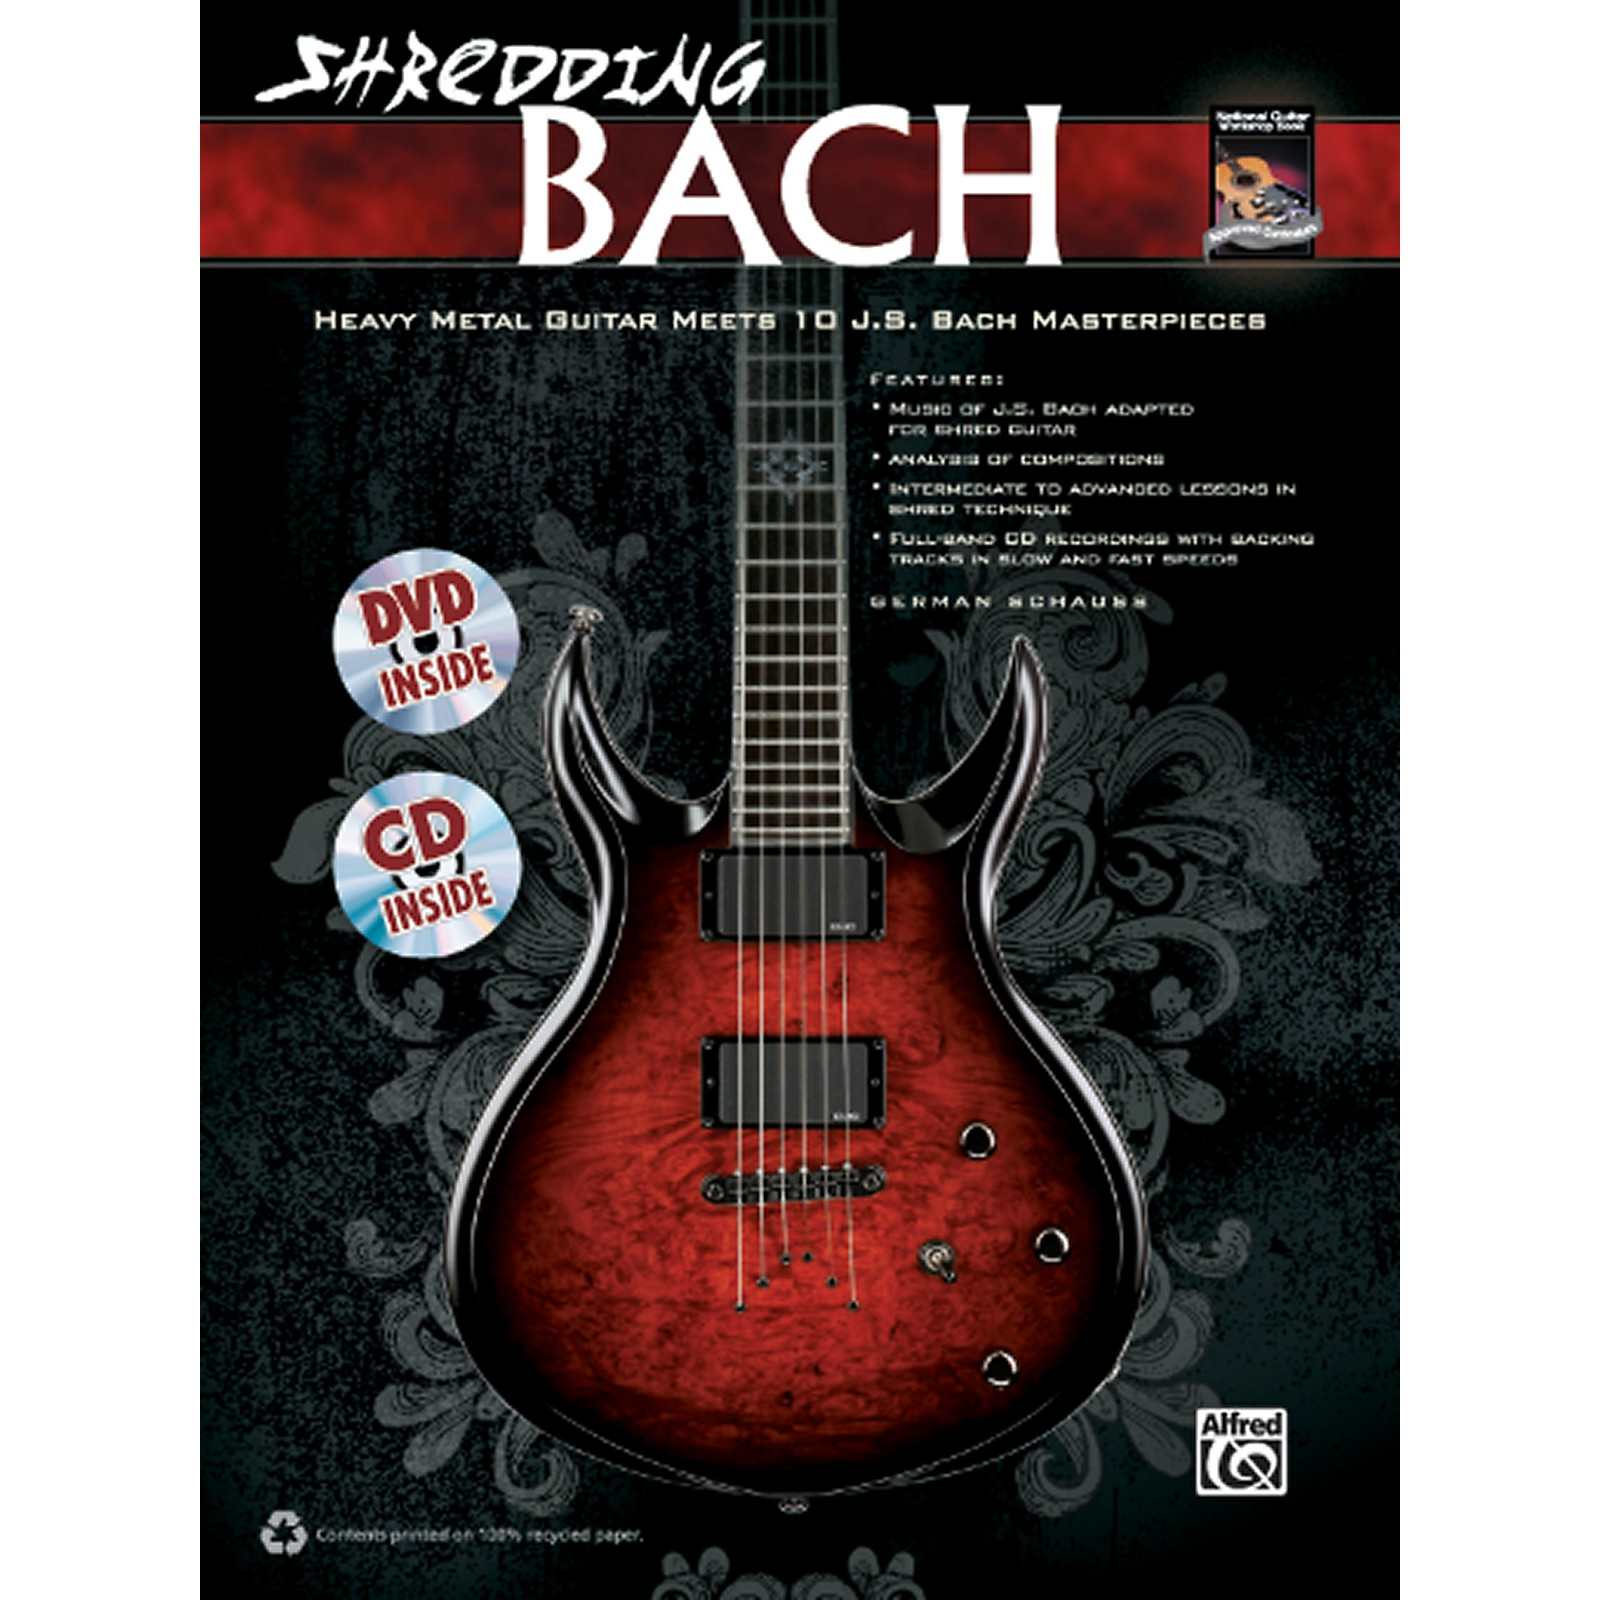 Alfred Shredding Bach Book, CD & DVD